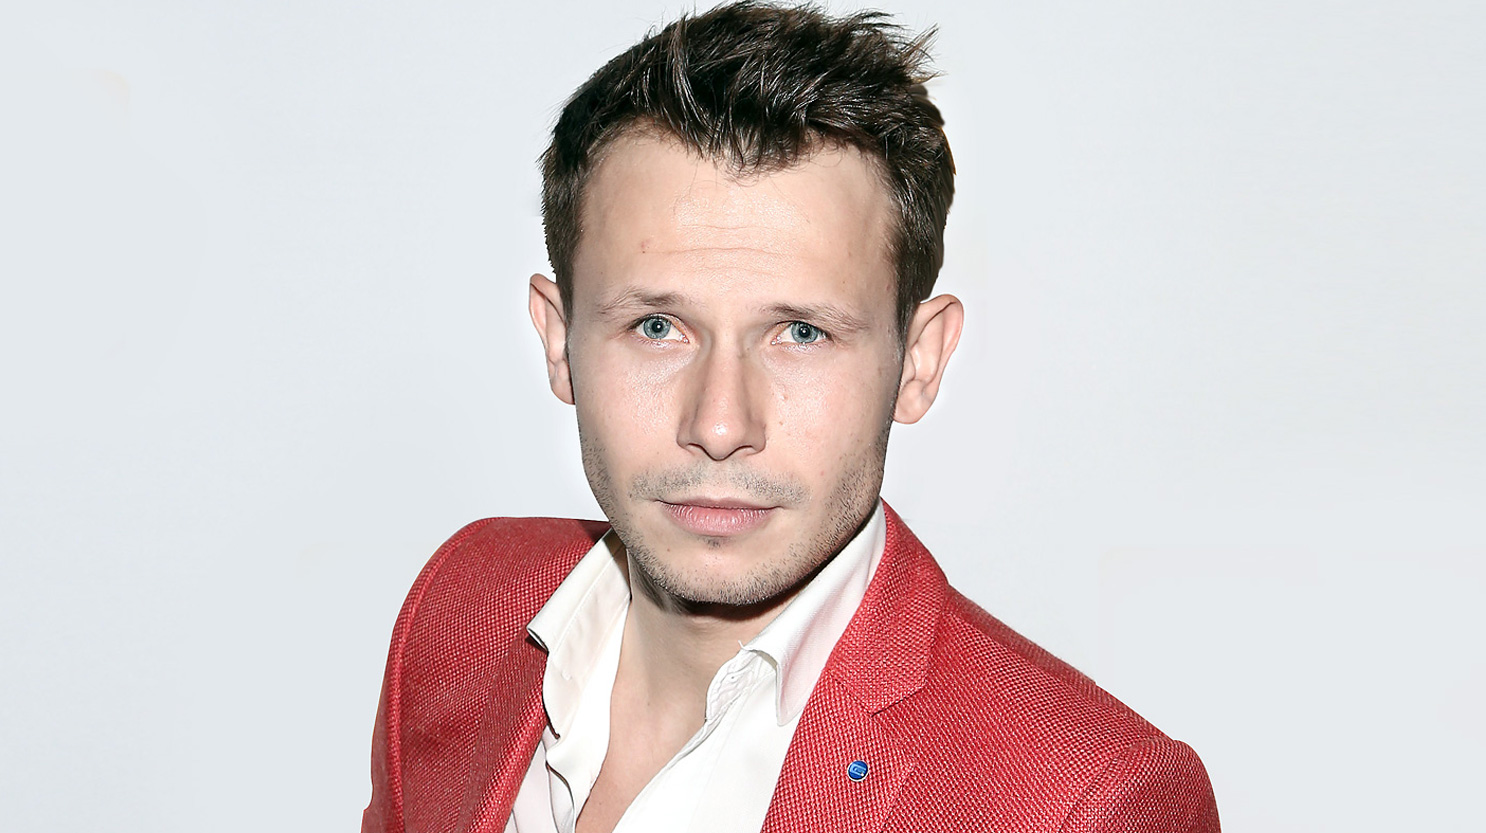 Miłość Mateusza Banasiuka rozkwita coraz mocniej - Polsat.pl